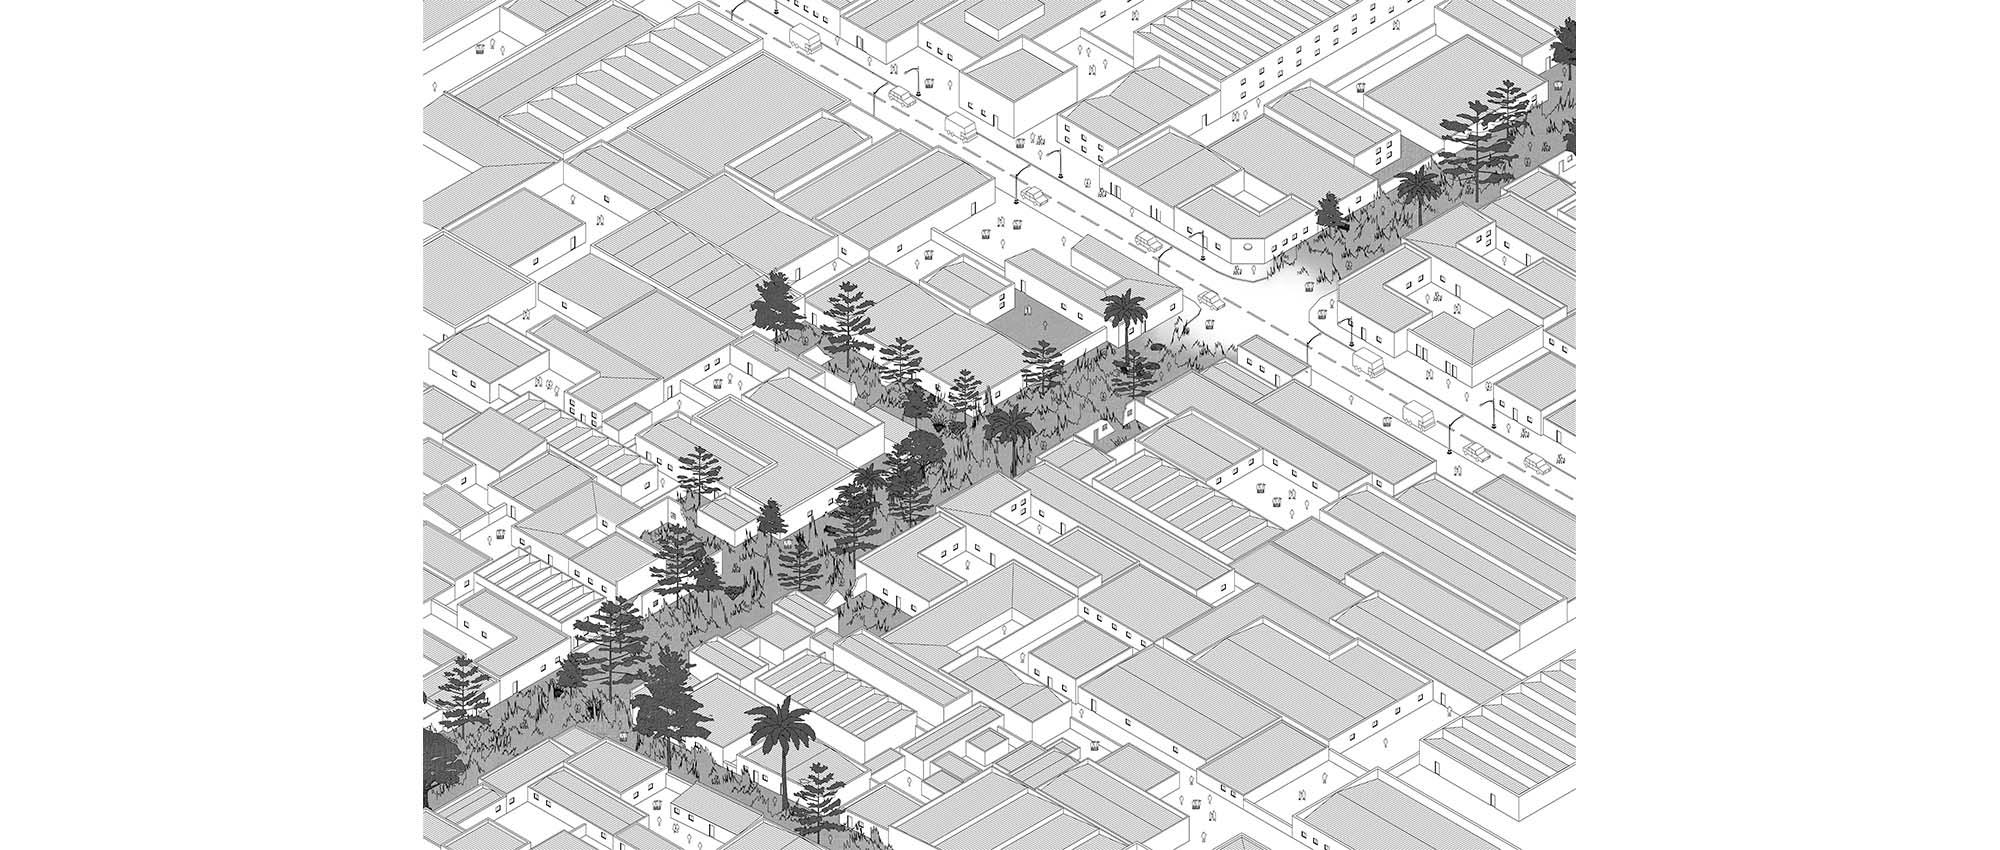 04_WILD STREETS.jpg